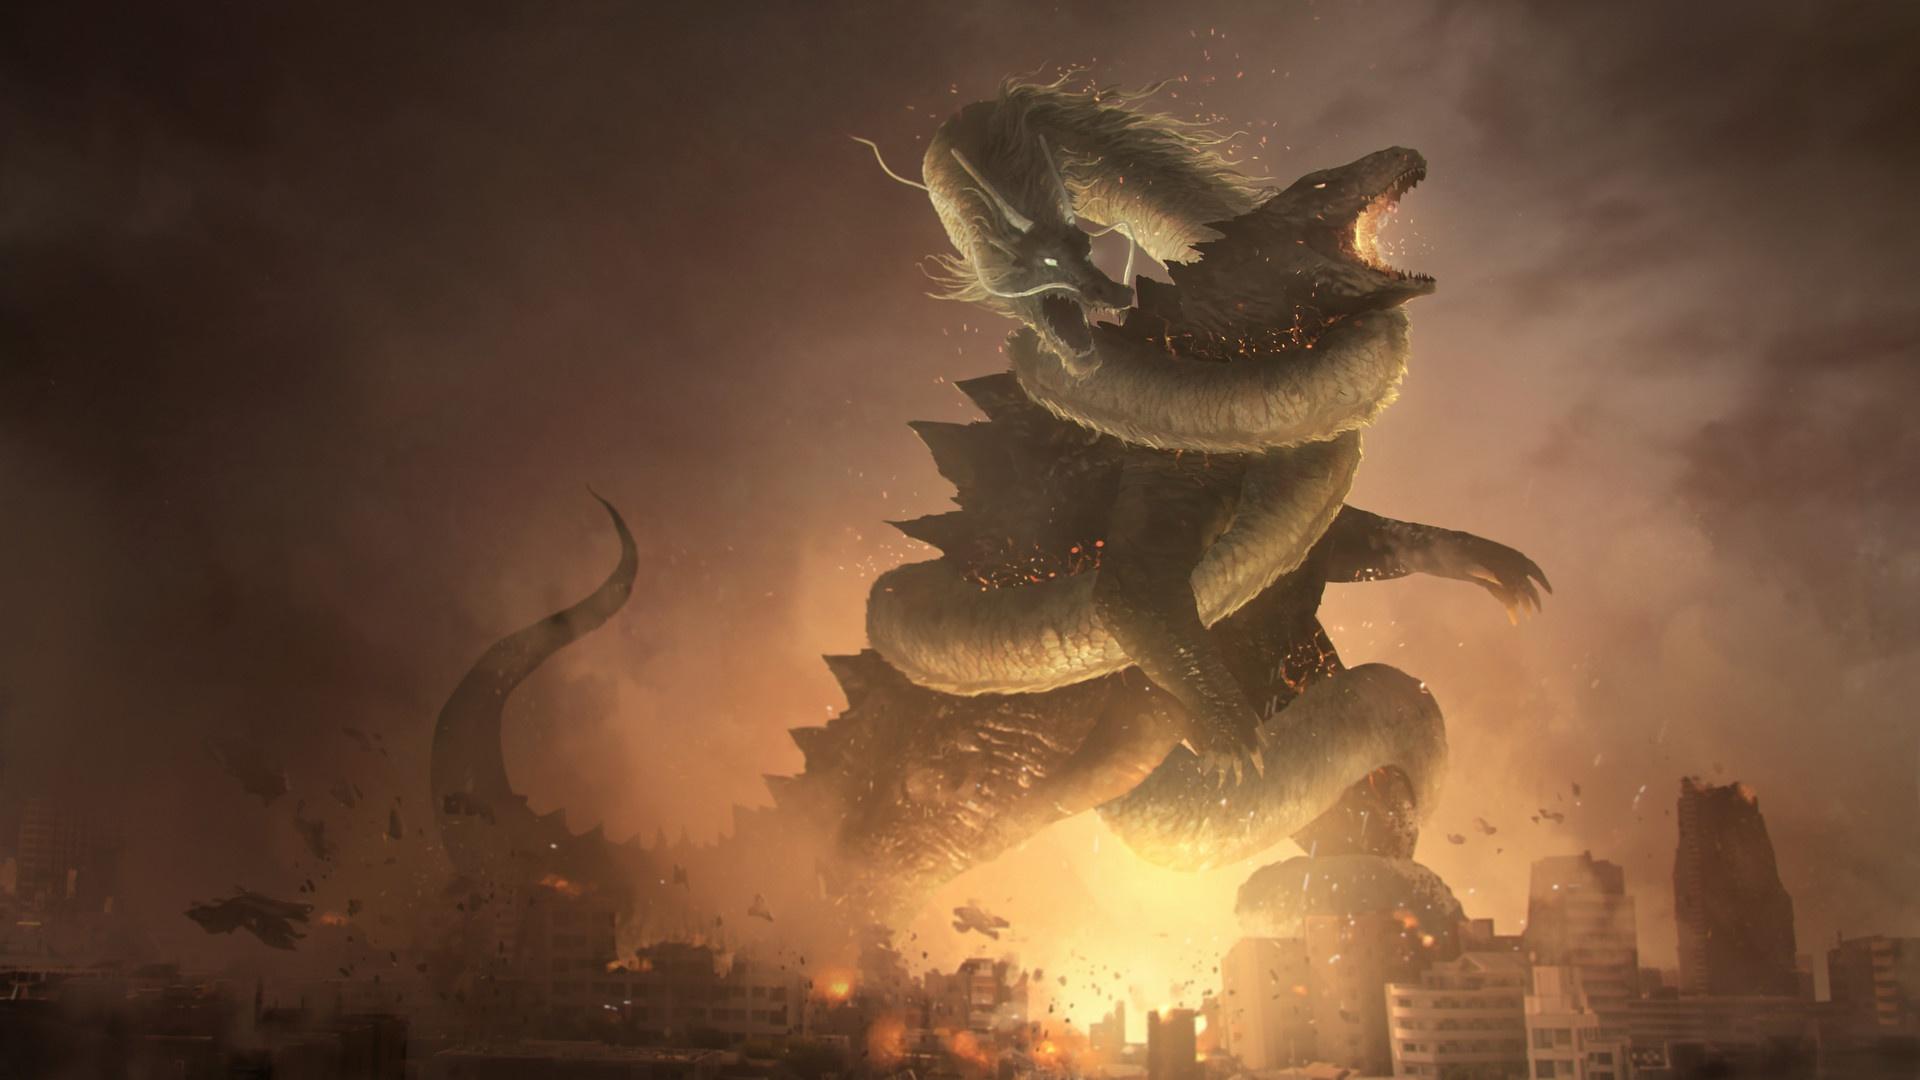 Battle Dragon Godzilla Kaiju Lao Shan Lung 1920x1080